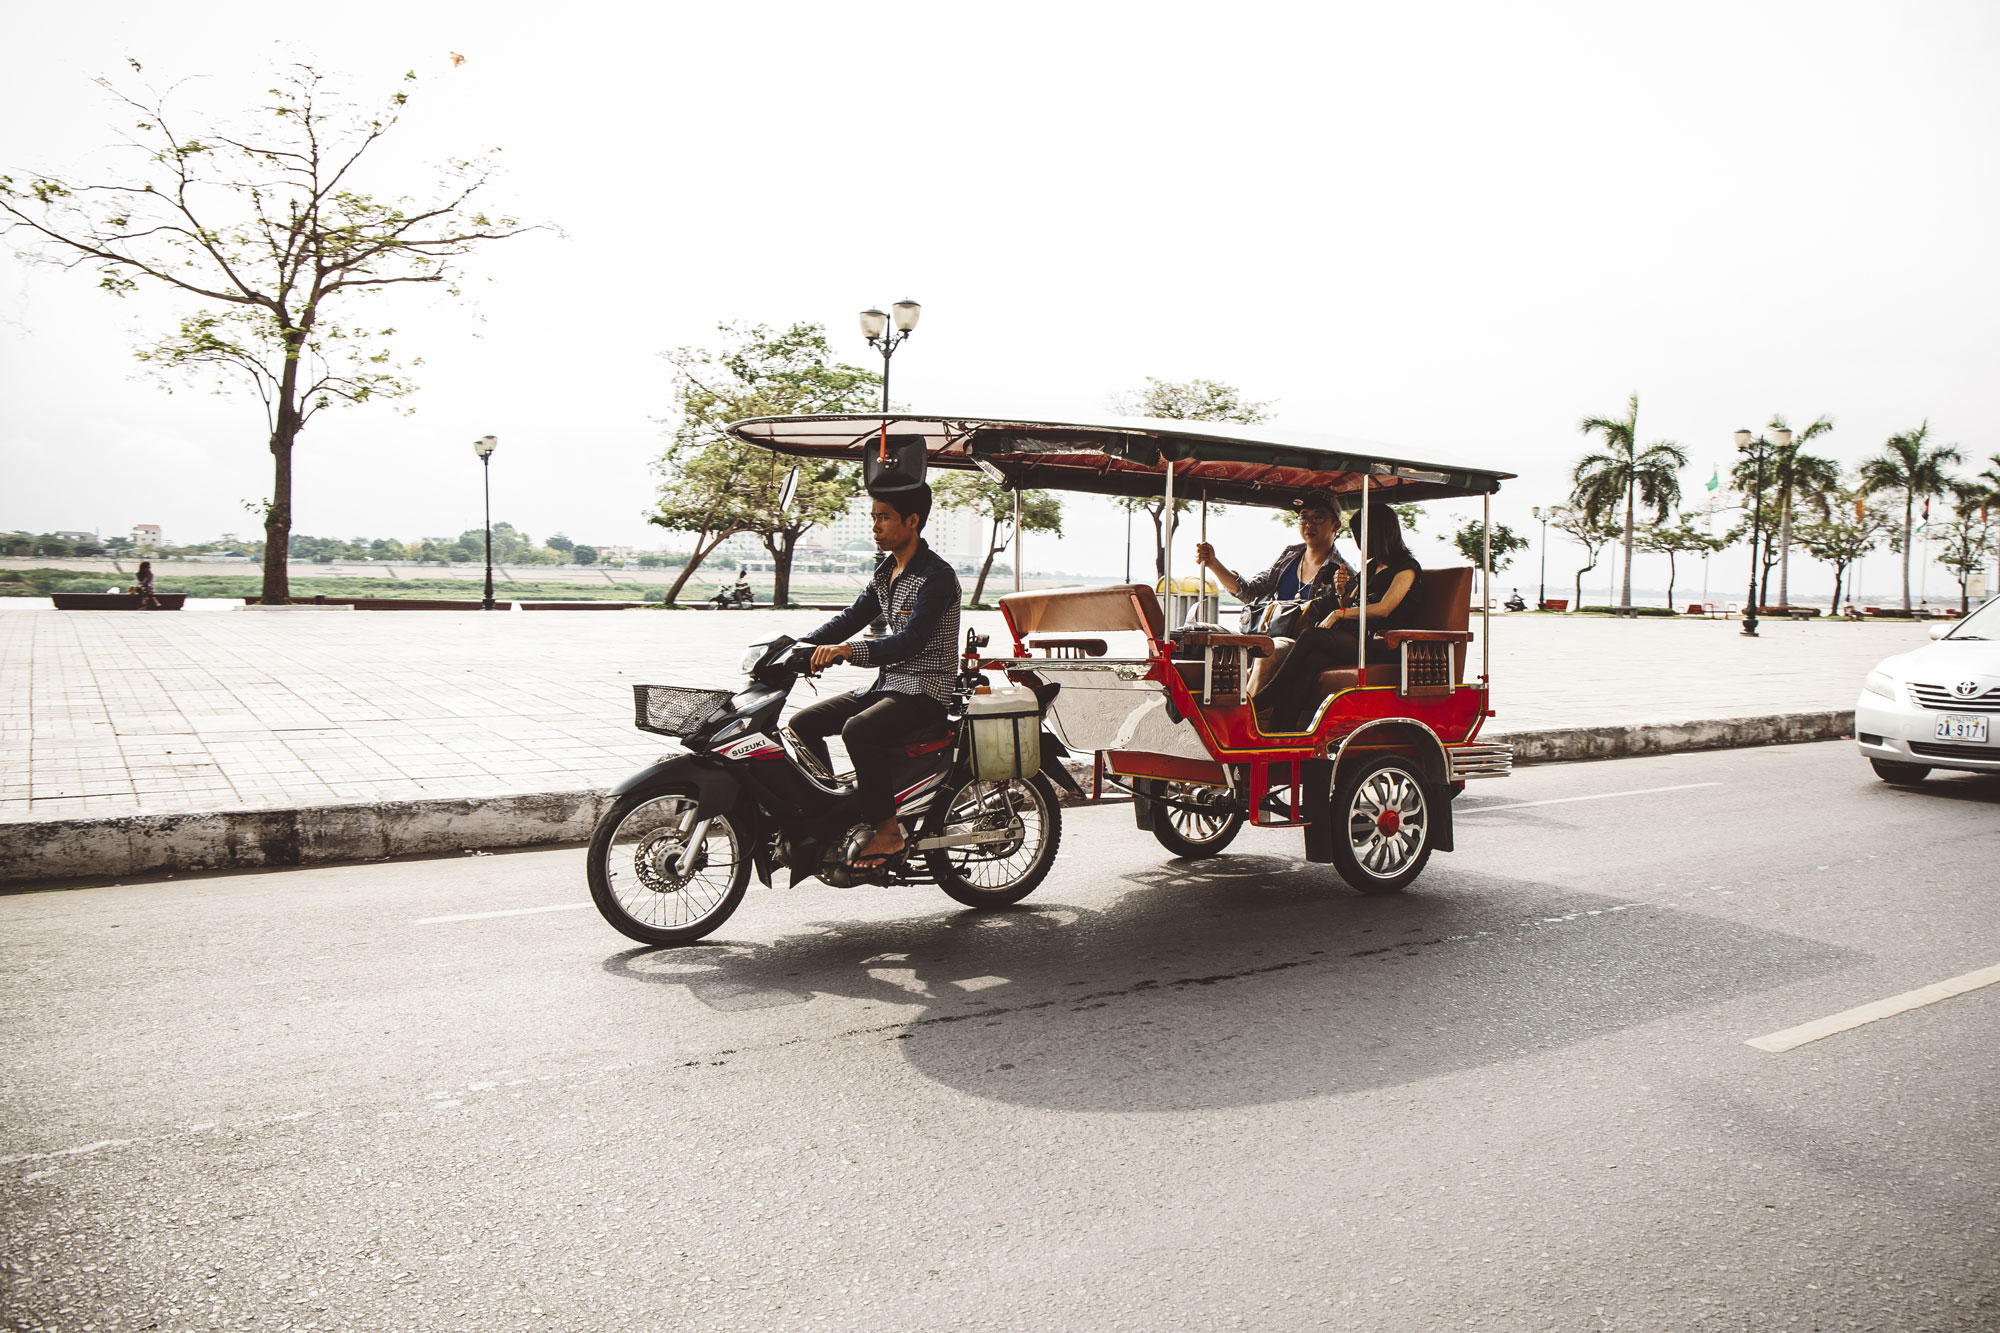 Tuktuk-Phnom-Penh-1_small.jpg